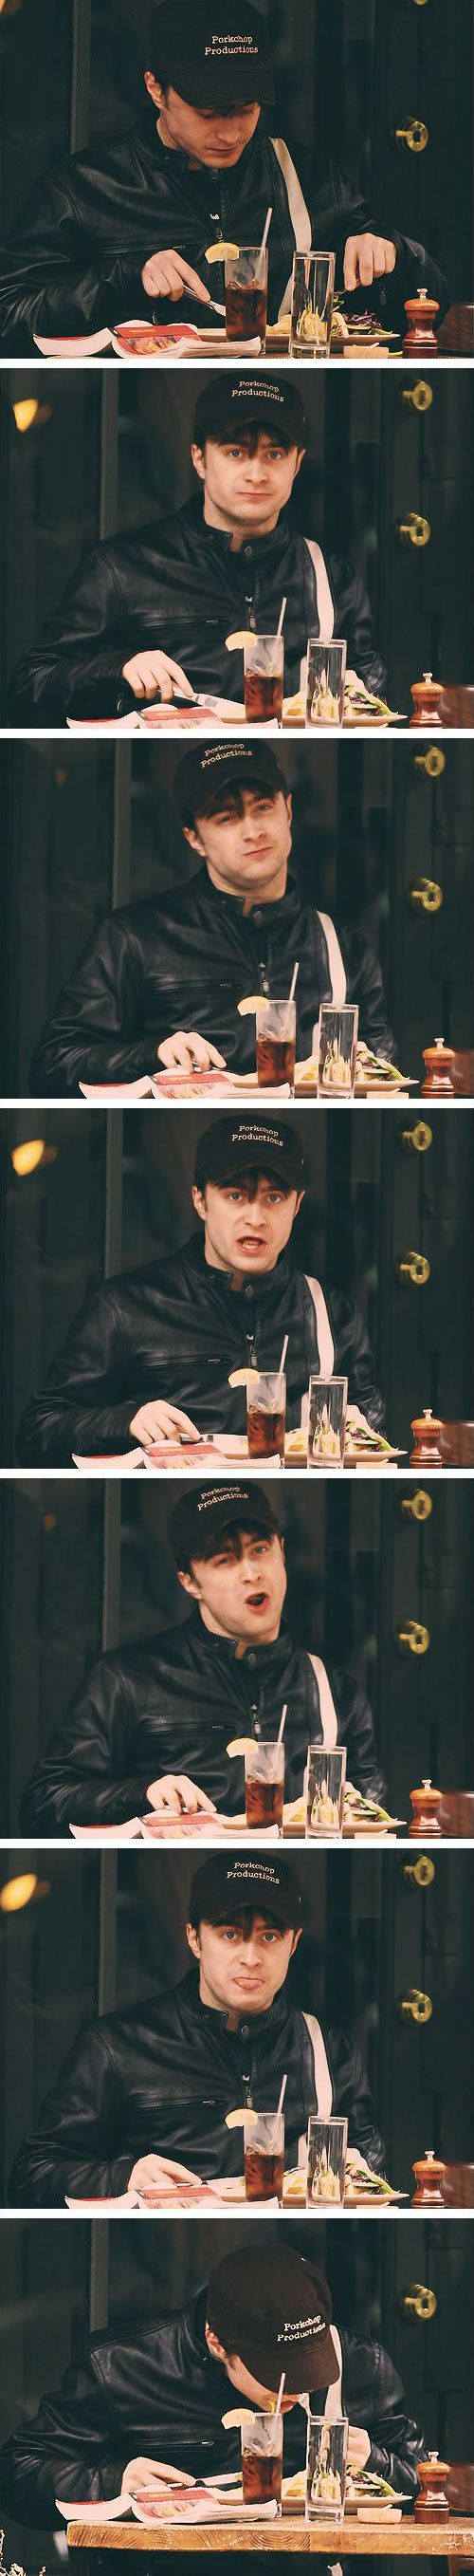 What happens when paparazzi catch Daniel Radcliffe eating…